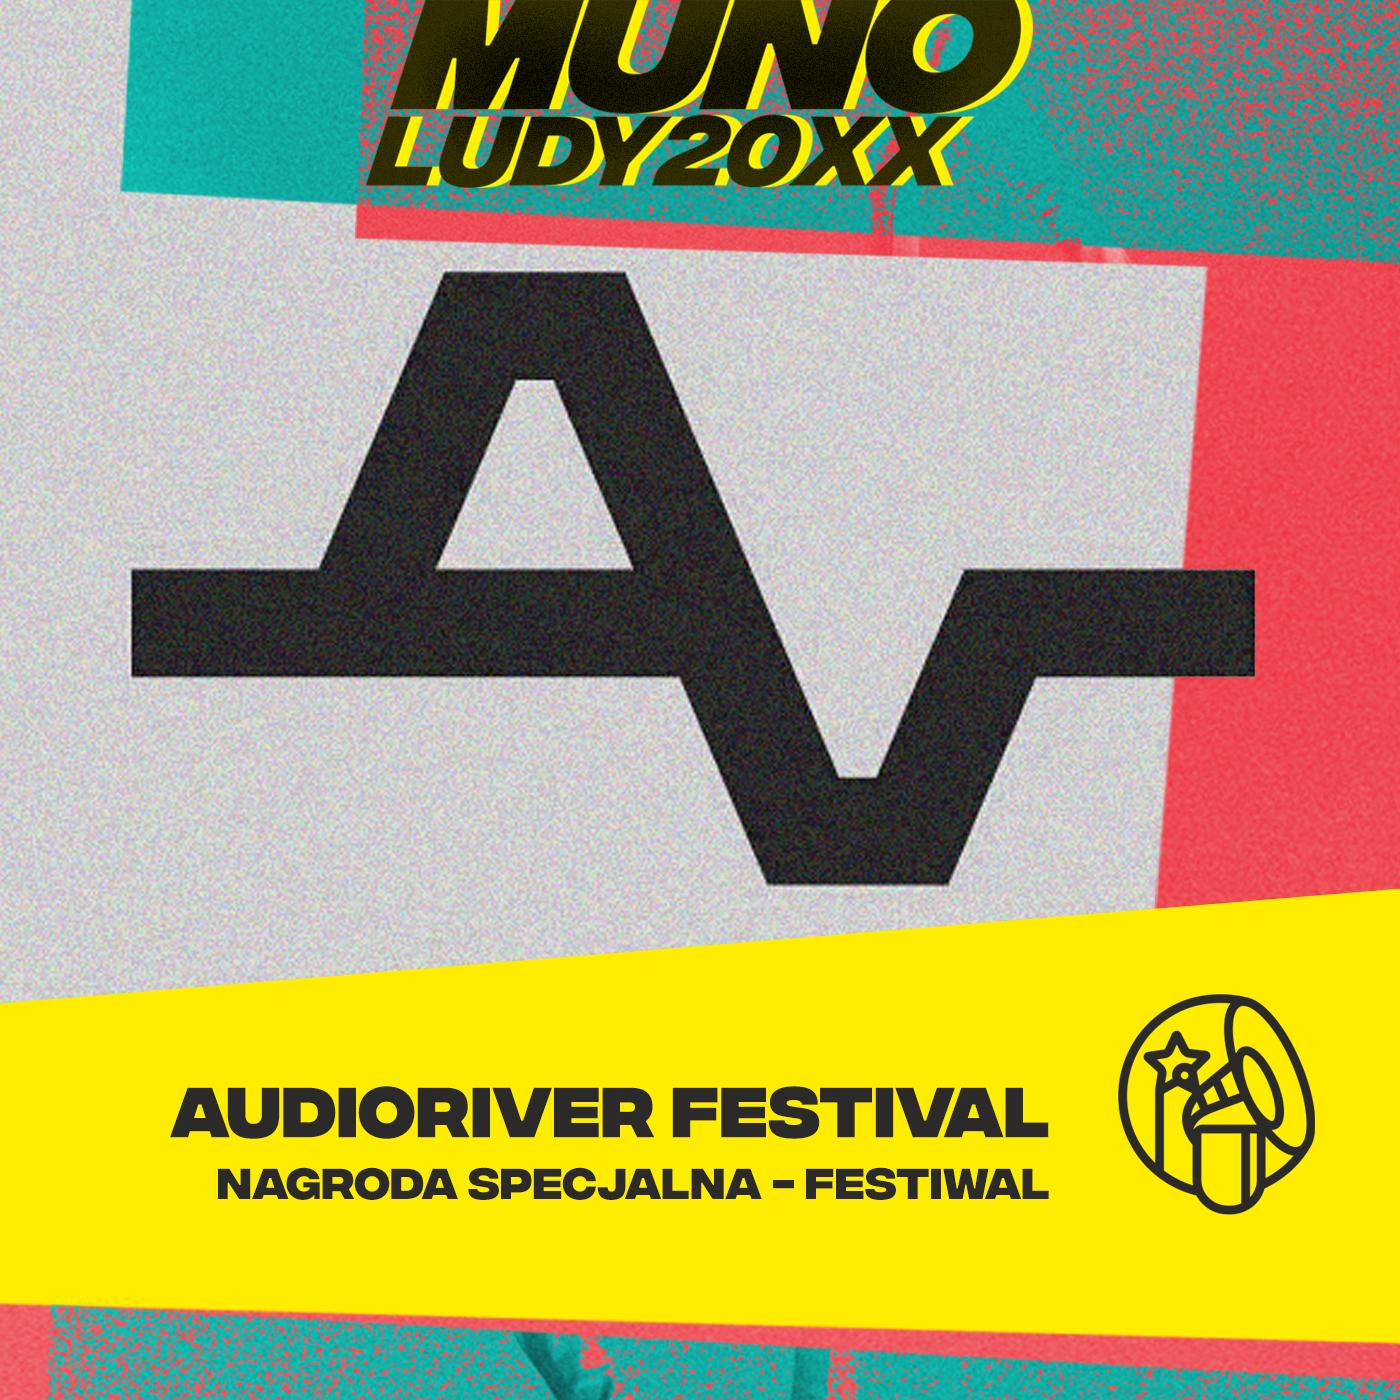 Nagroda Specjalna Munoludy 20XX - Festiwal: Audioriver Festival